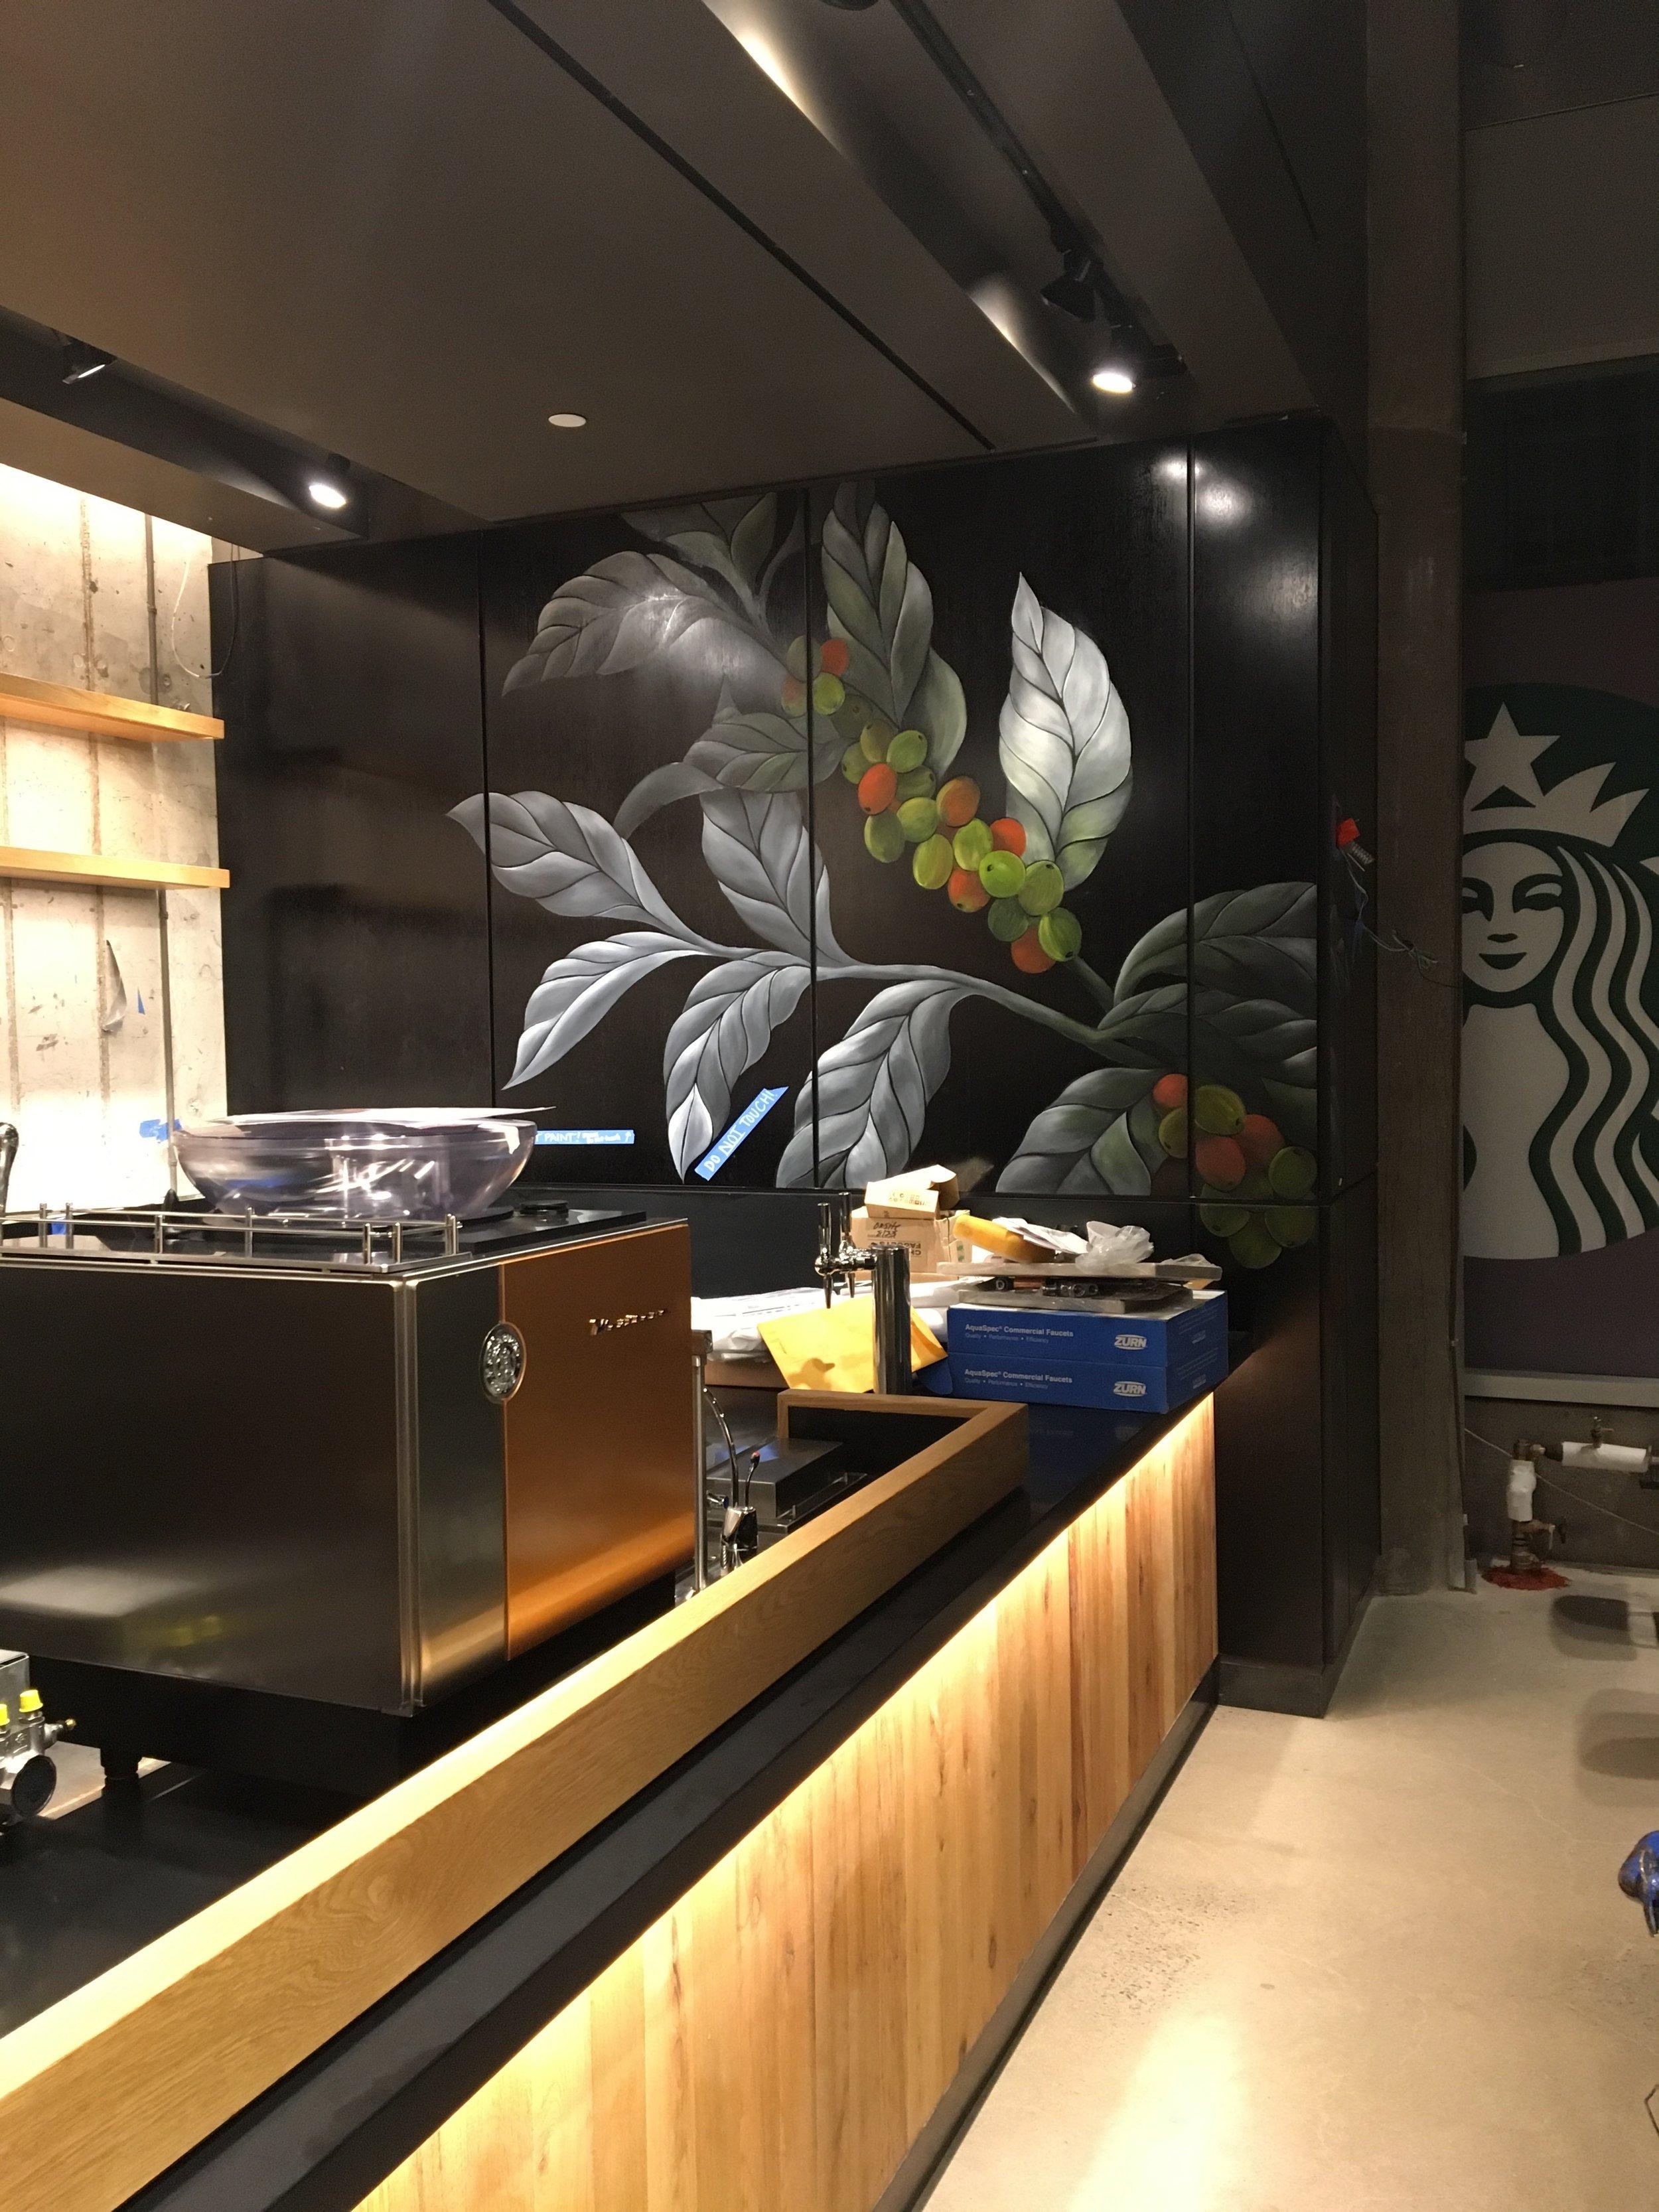 Starbucks - NYC - Oil Painting on panels